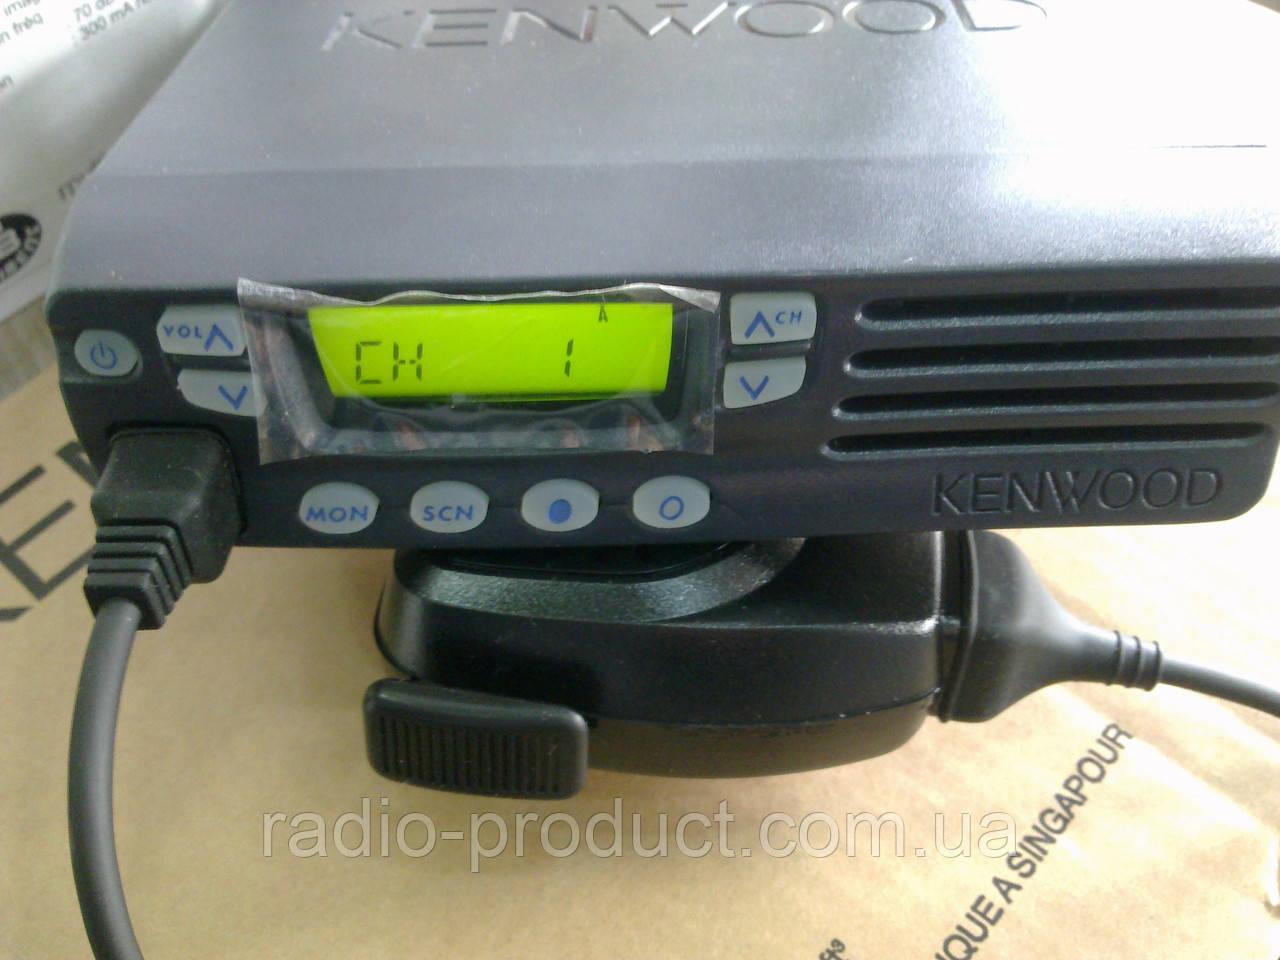 Kenwood TK-8100H, 400-435 MHz, 45 W